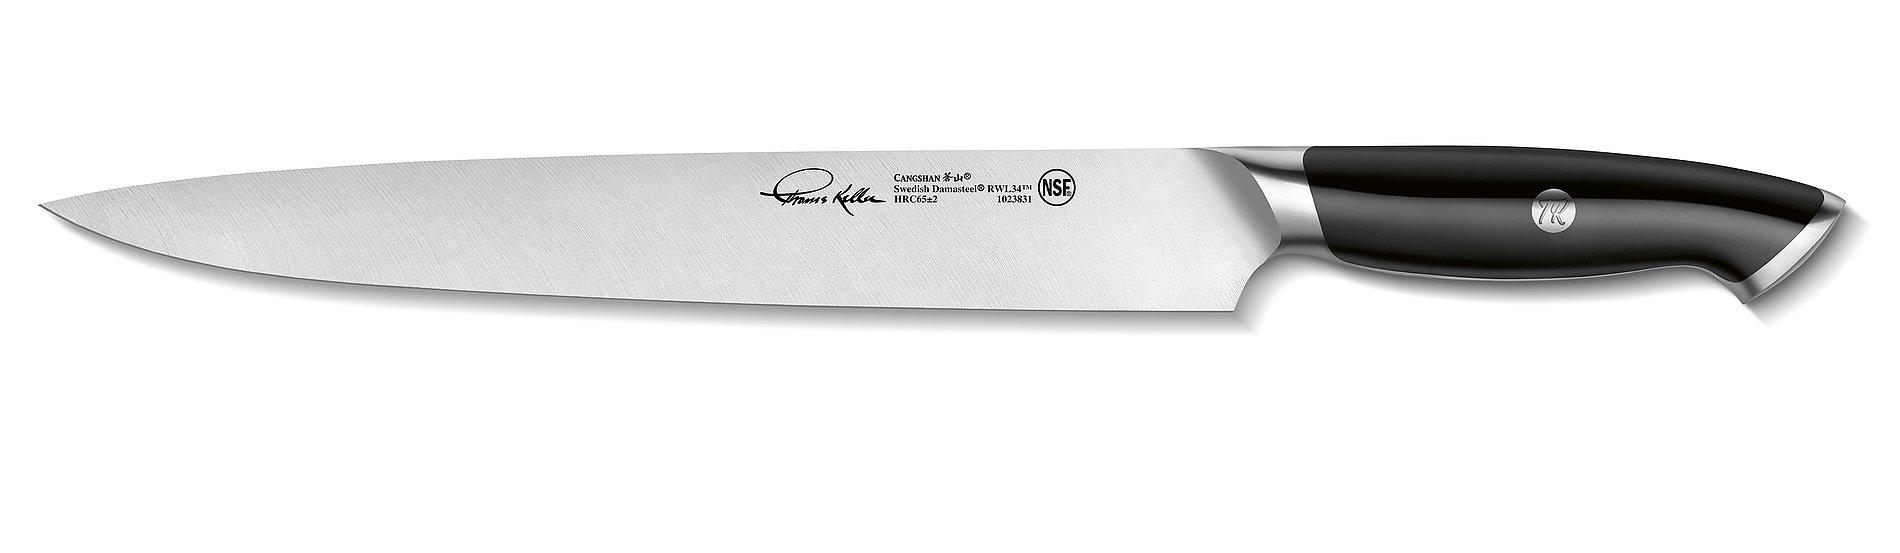 Thomas Keller Signature Collection | Red Dot Design Award